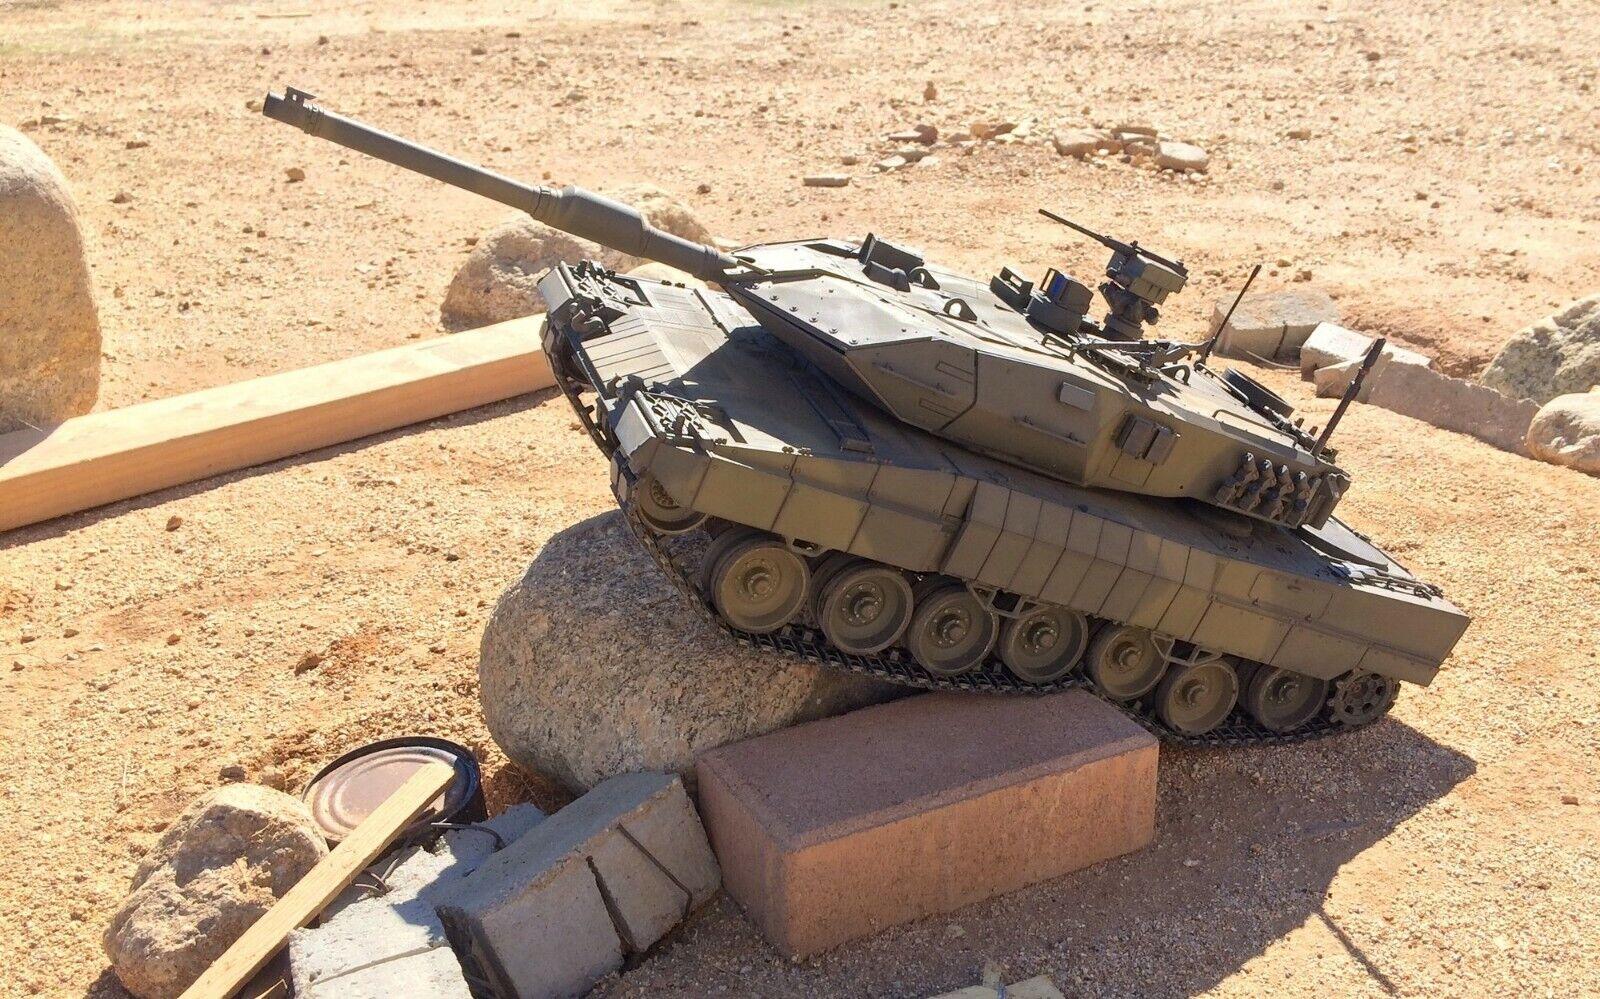 Nuevo Heng Long Tanque De Radio Control Remoto Controlado Leopard 2A6 BB Tiro 2.4G 1 16 RTR